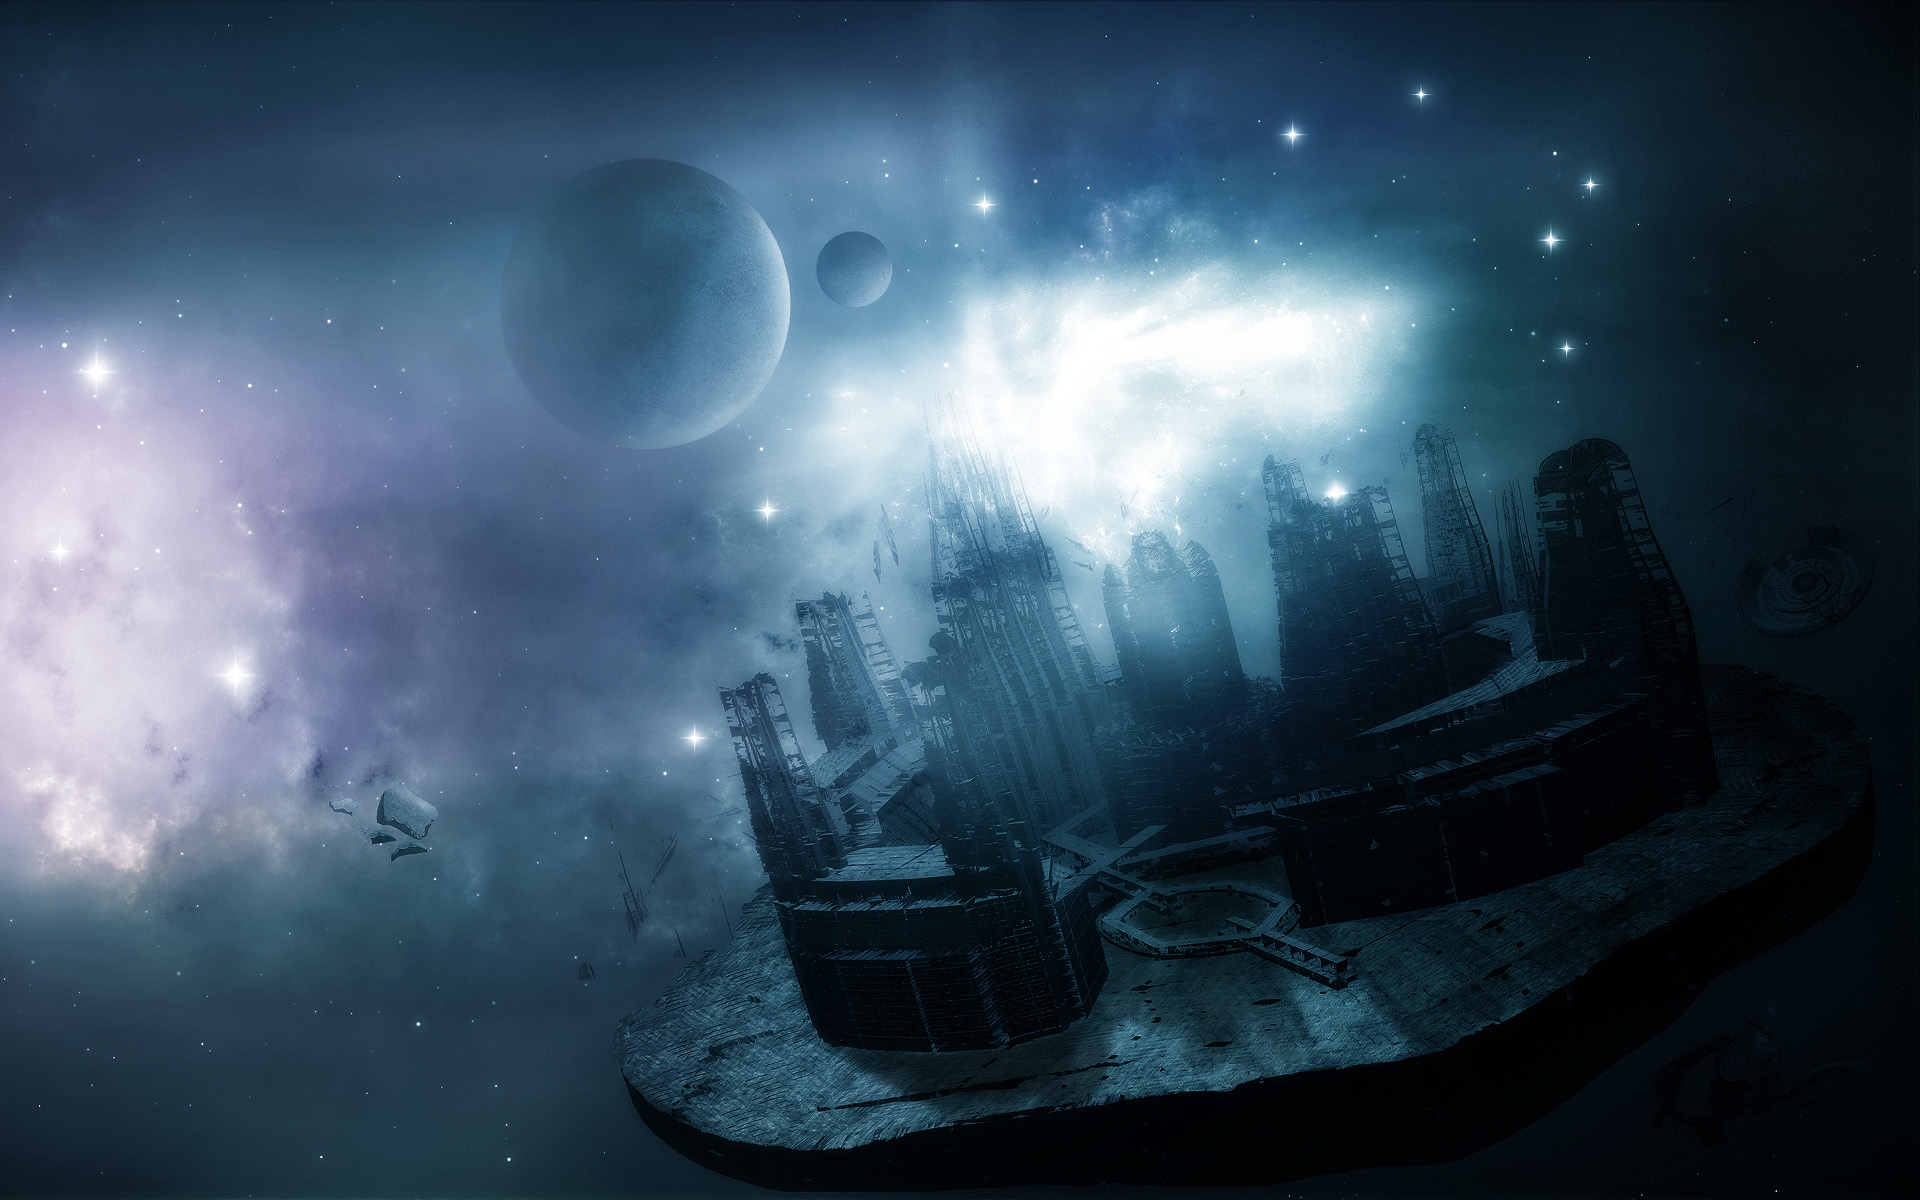 in spce future space planets desktop wallpaper screensaver background 1920x1200